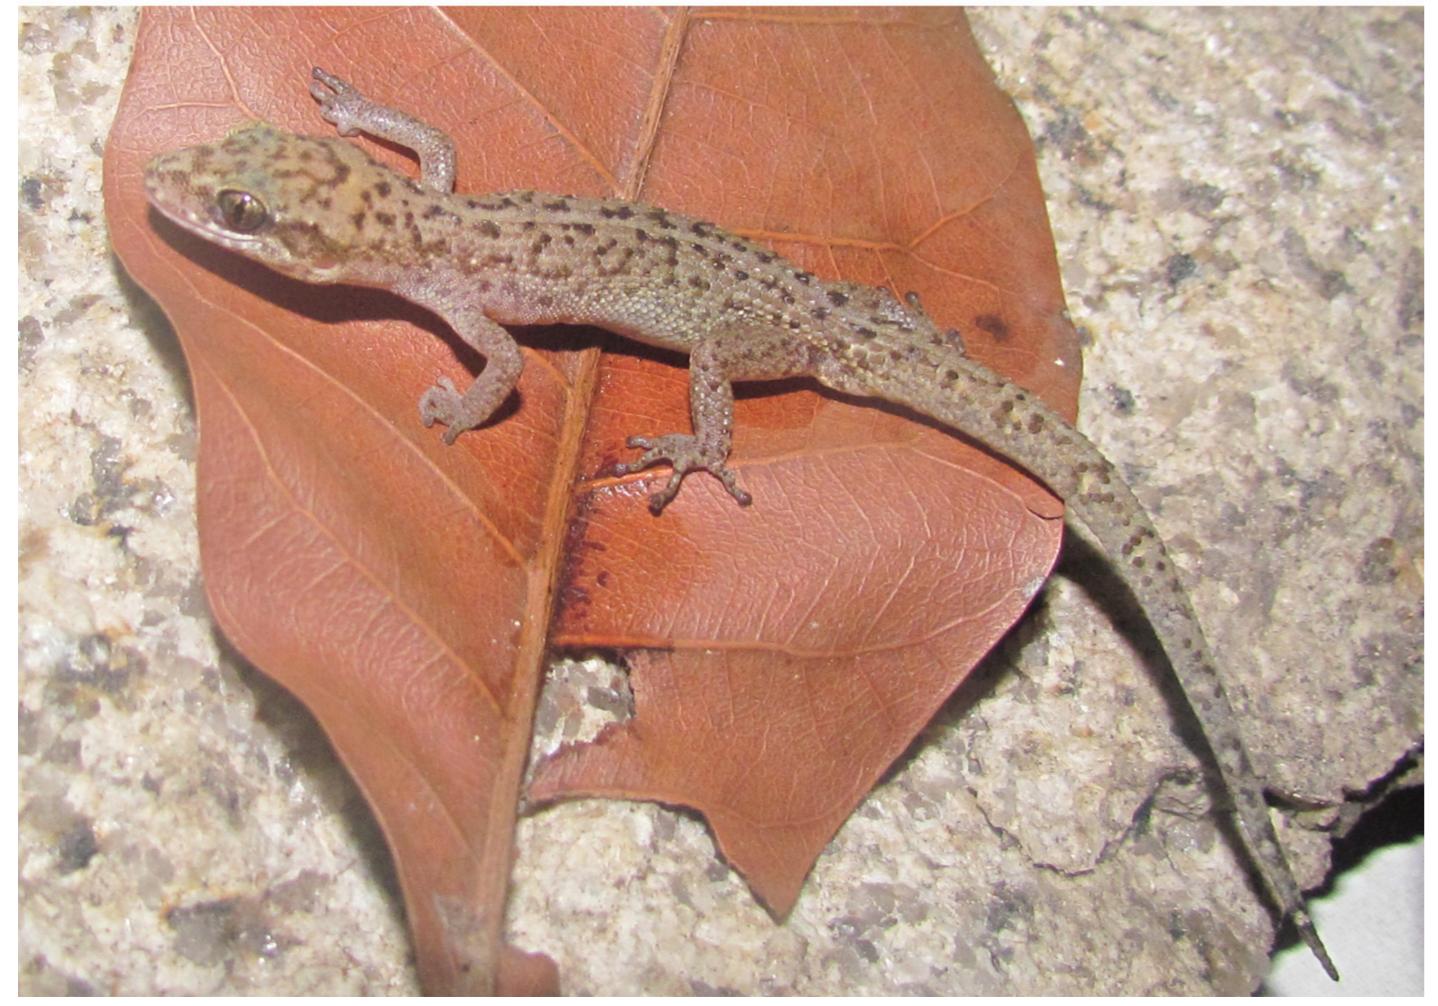 A New Geckoin Vietnam - 2016. Ziegler, T., Botov, A., Nguyen, T.T., Bauer, A.M., Brennan, I.G., Ngo, H.T., Nguyen, T.Q.First molecular verification of Dixonius vietnamensis Das, 2004 (Squamata: Gekkonidae) with the description of a new species from Vinh Cuu Nature Reserve, Dong Nai Province, Vietnam.Zootaxa 4136 (3):553-566. Link or Download.